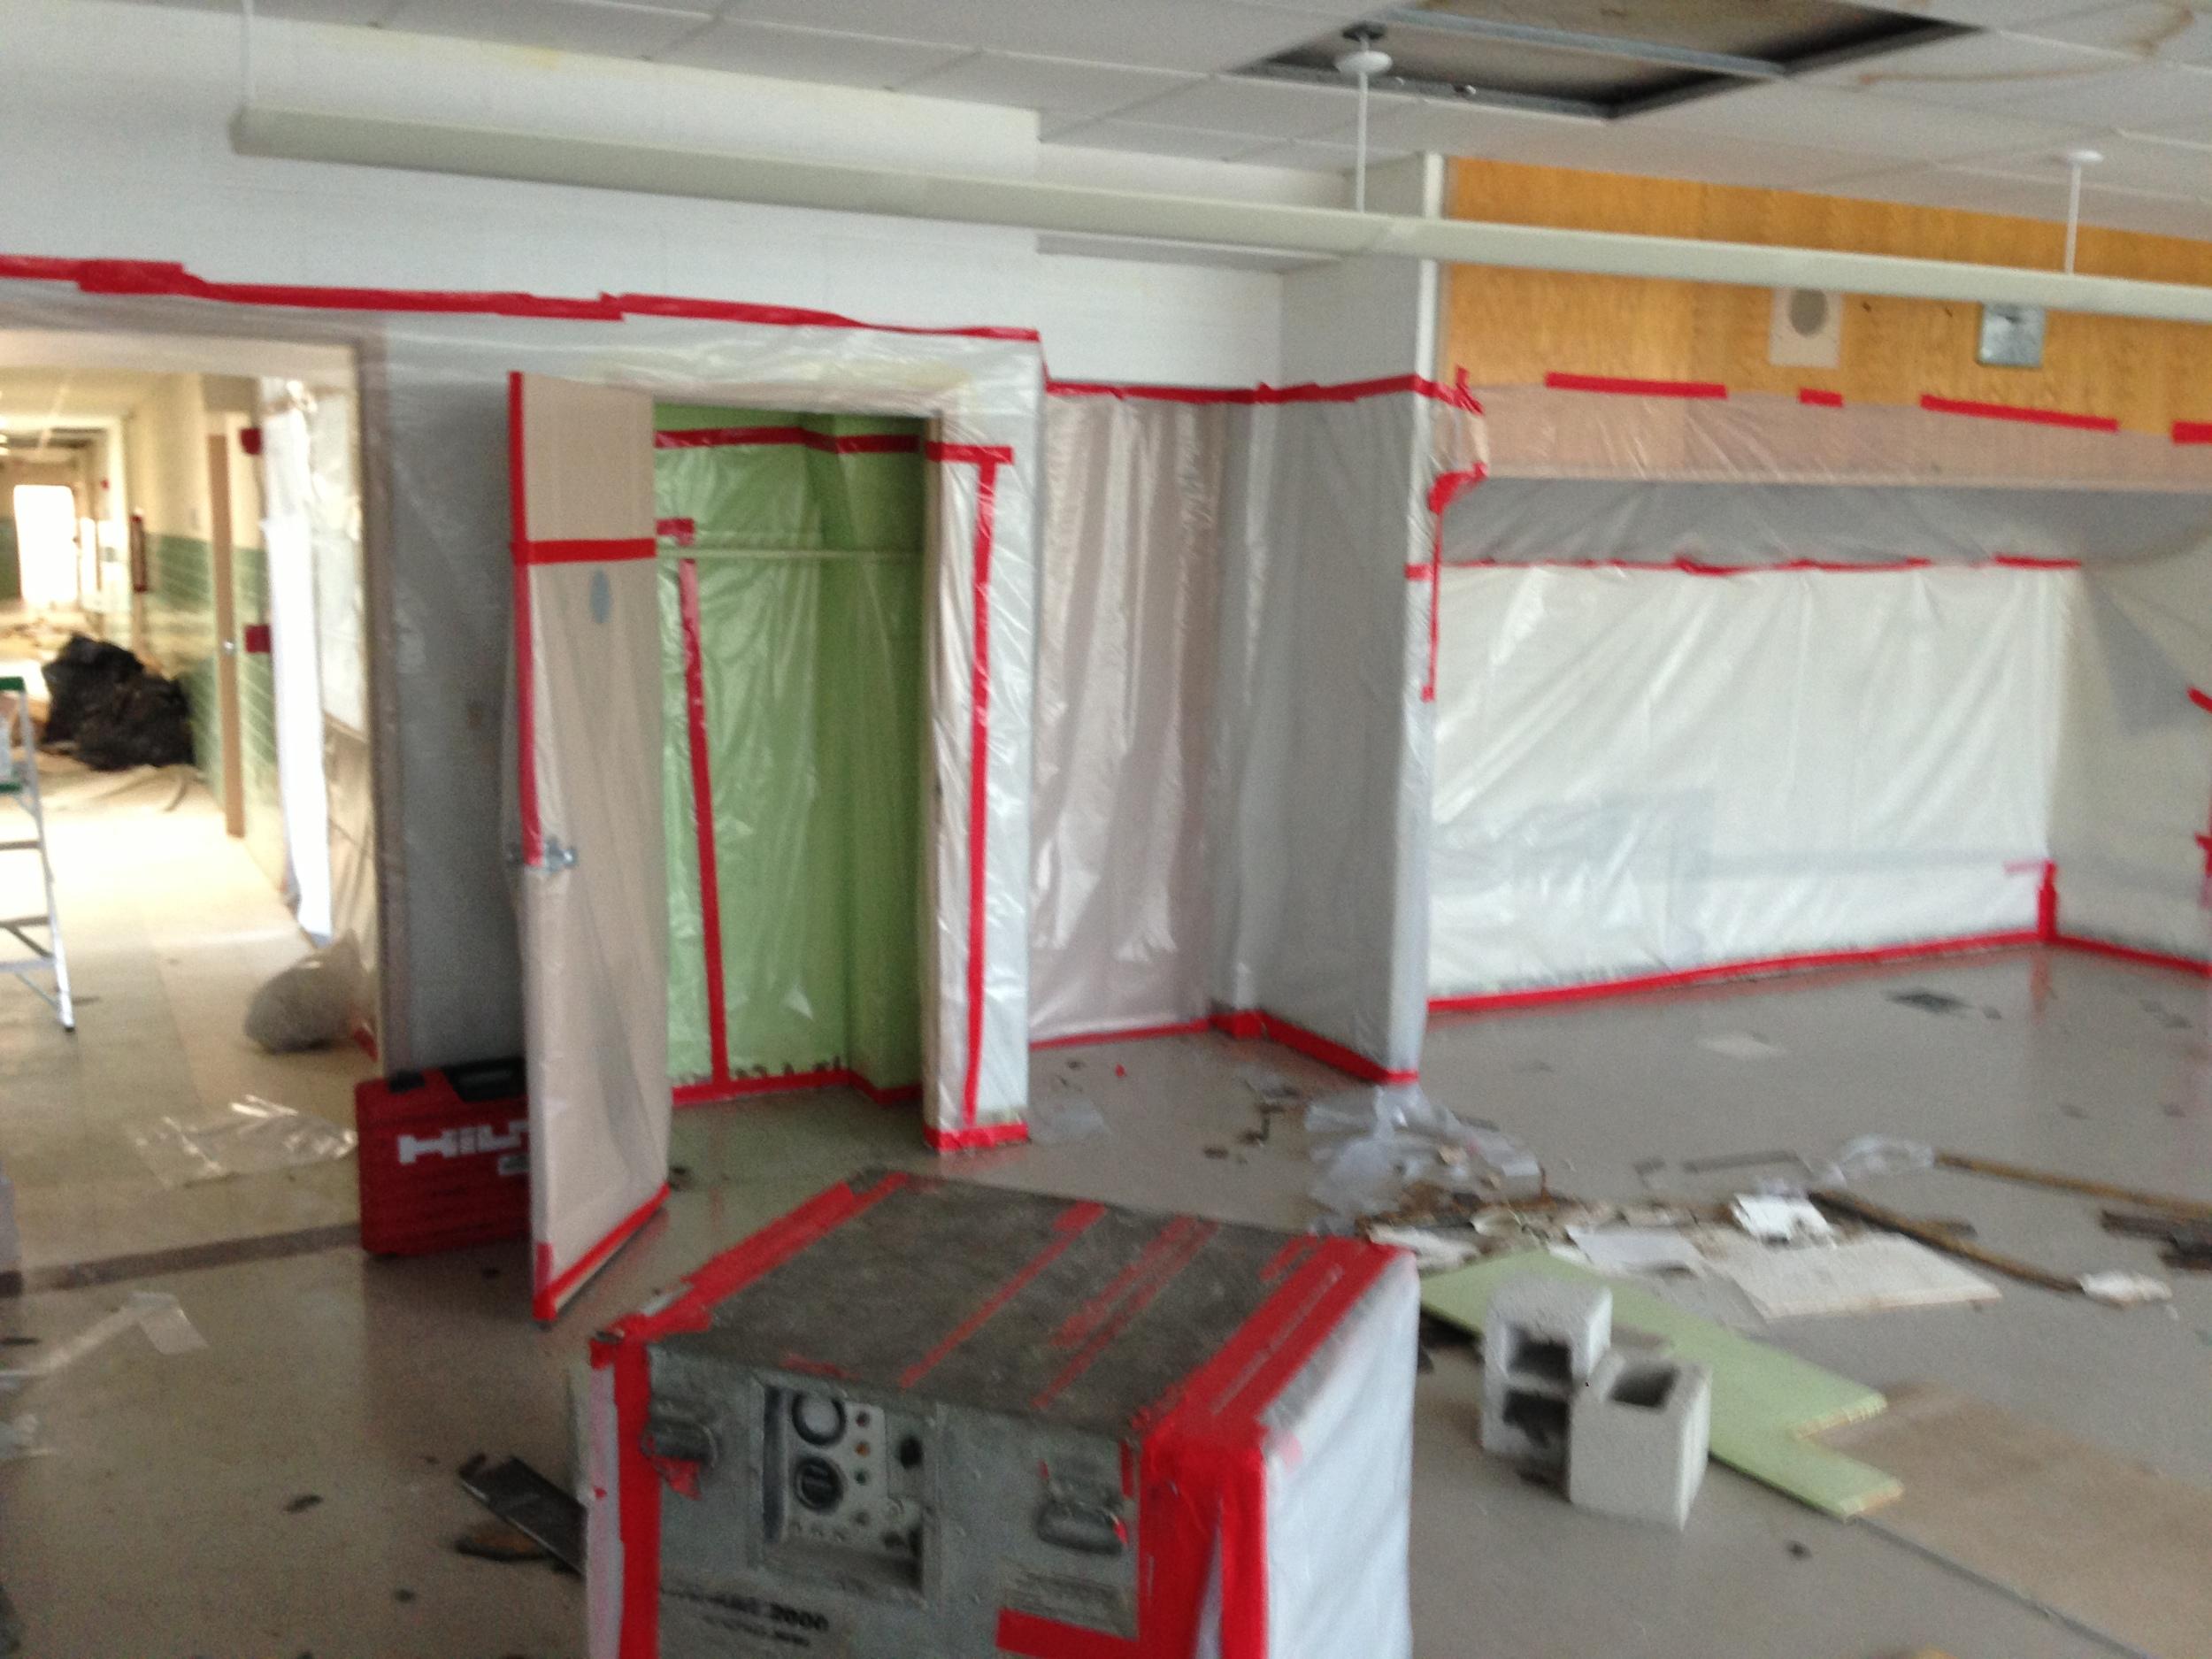 Demolition on the interior